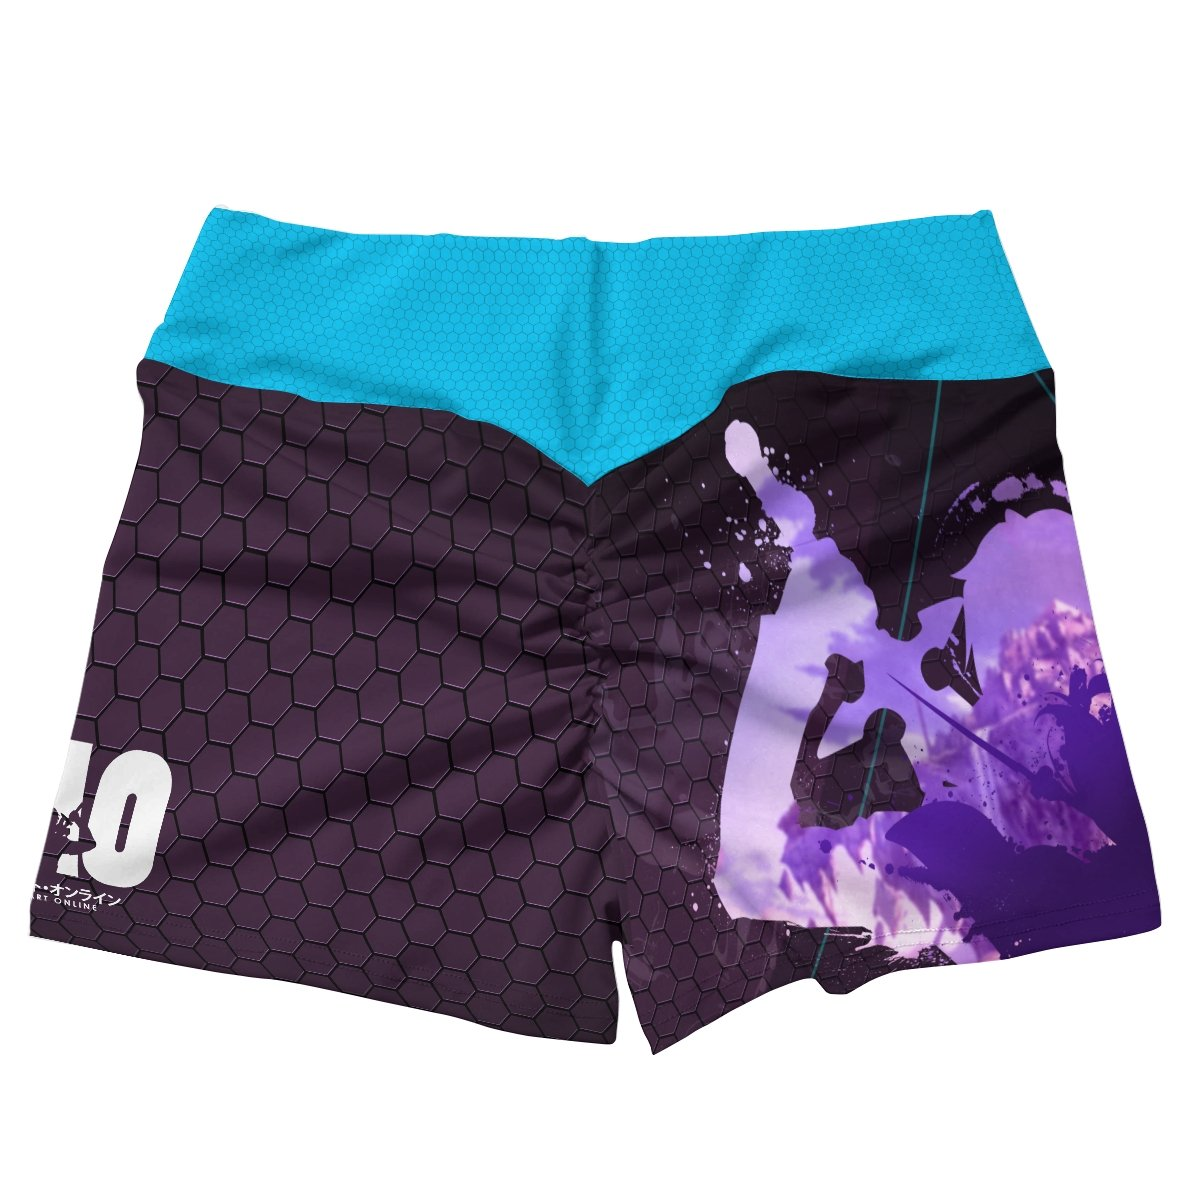 sao summer active wear set 433854 - Anime Swimsuits